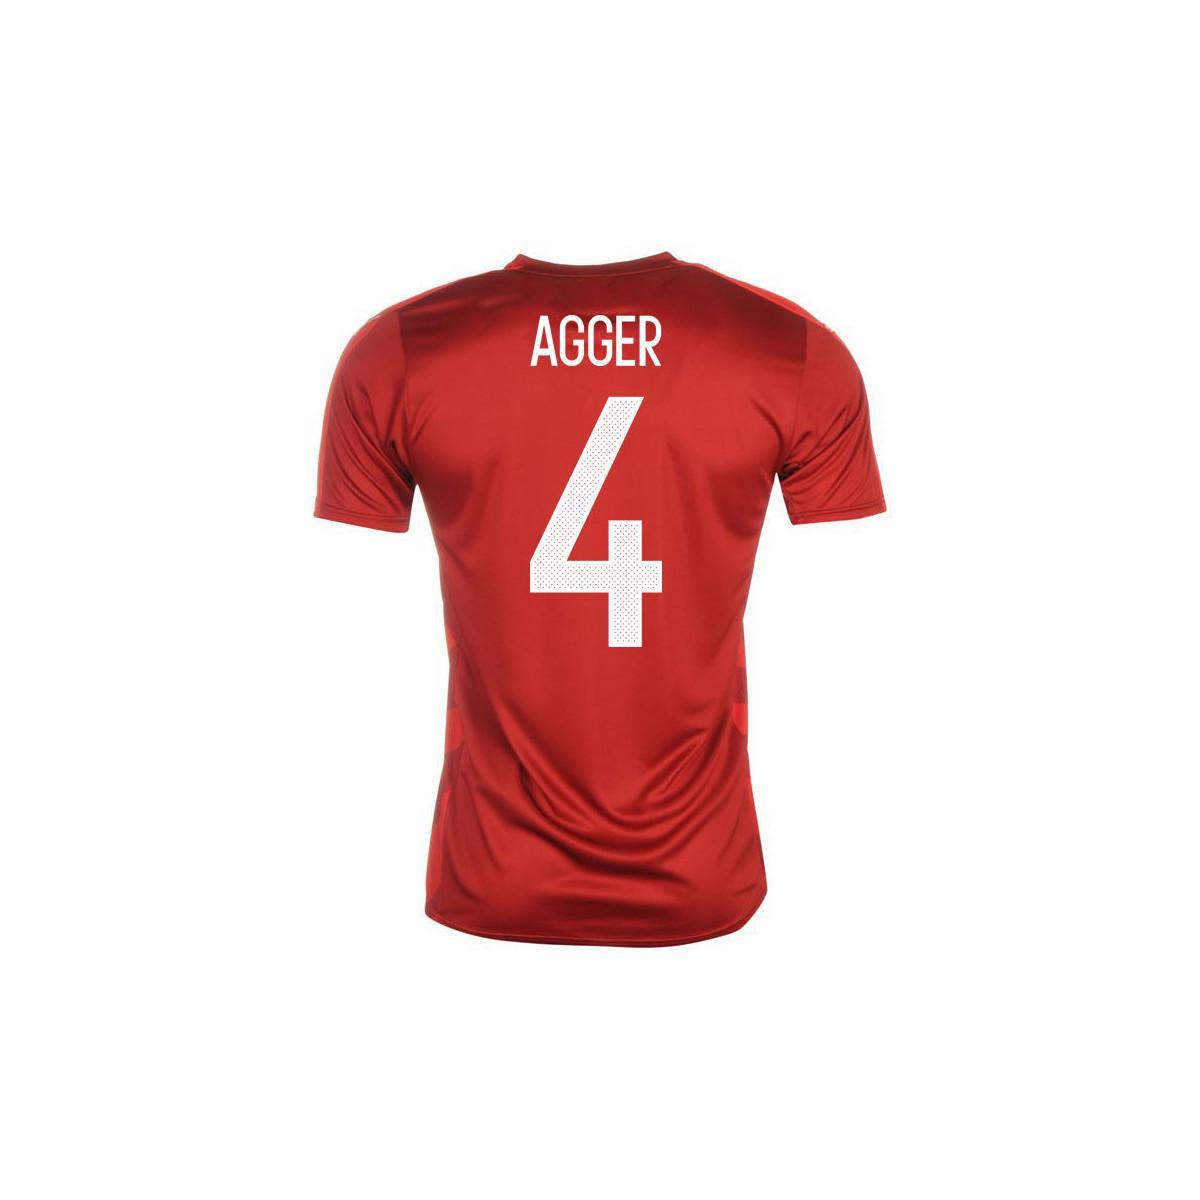 Lyst - Adidas 2016-2017 Denmark Home Shirt (agger 4) Men s T Shirt ... 8626fbdda